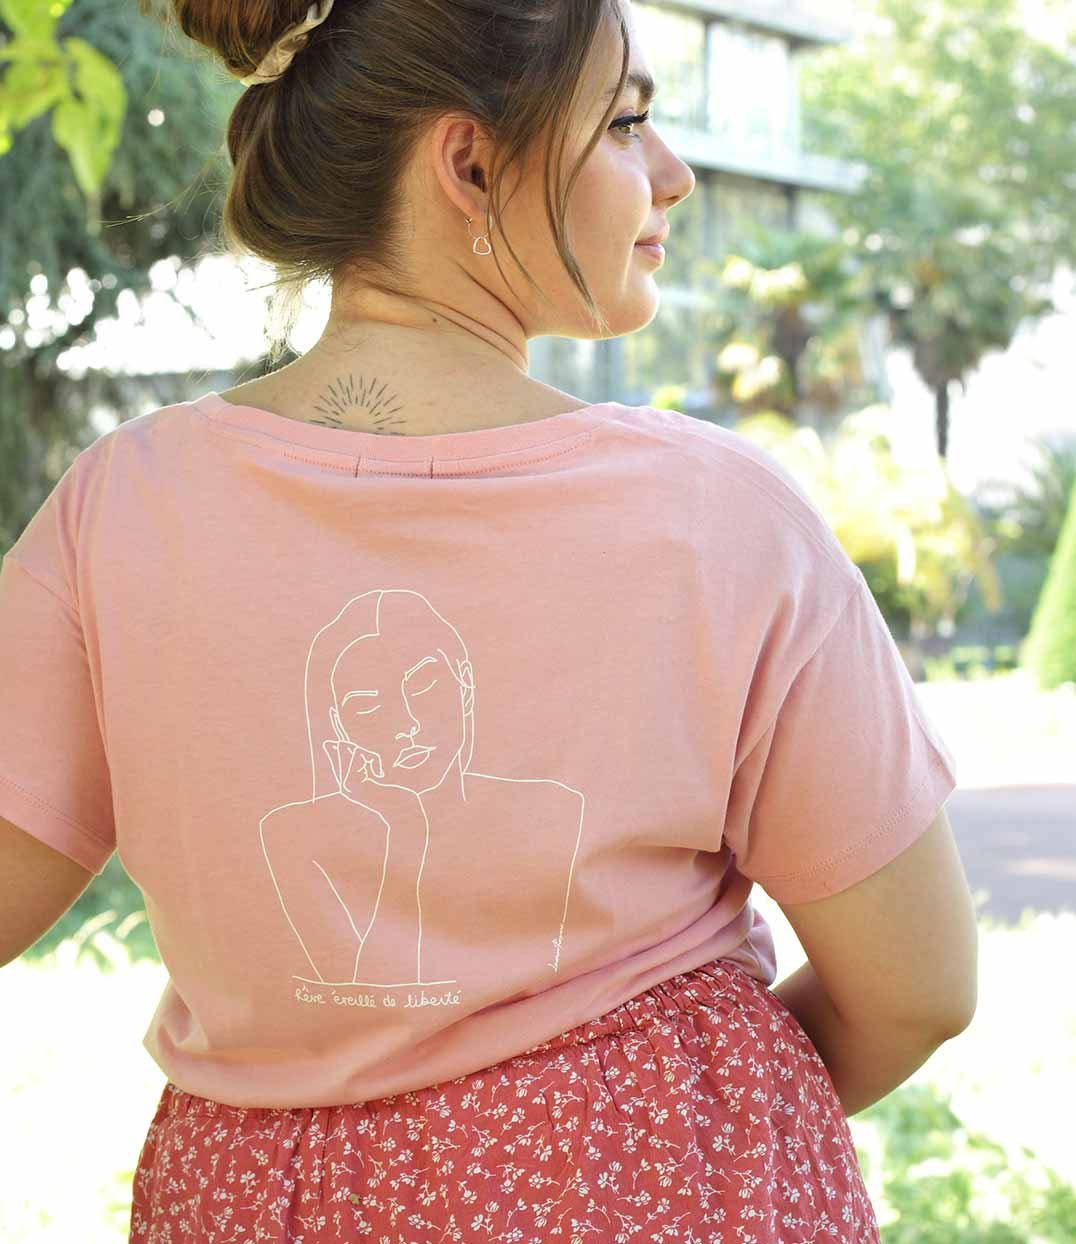 jeune femme qui porte un t-shirt rose thémis de la marque leonor roversi